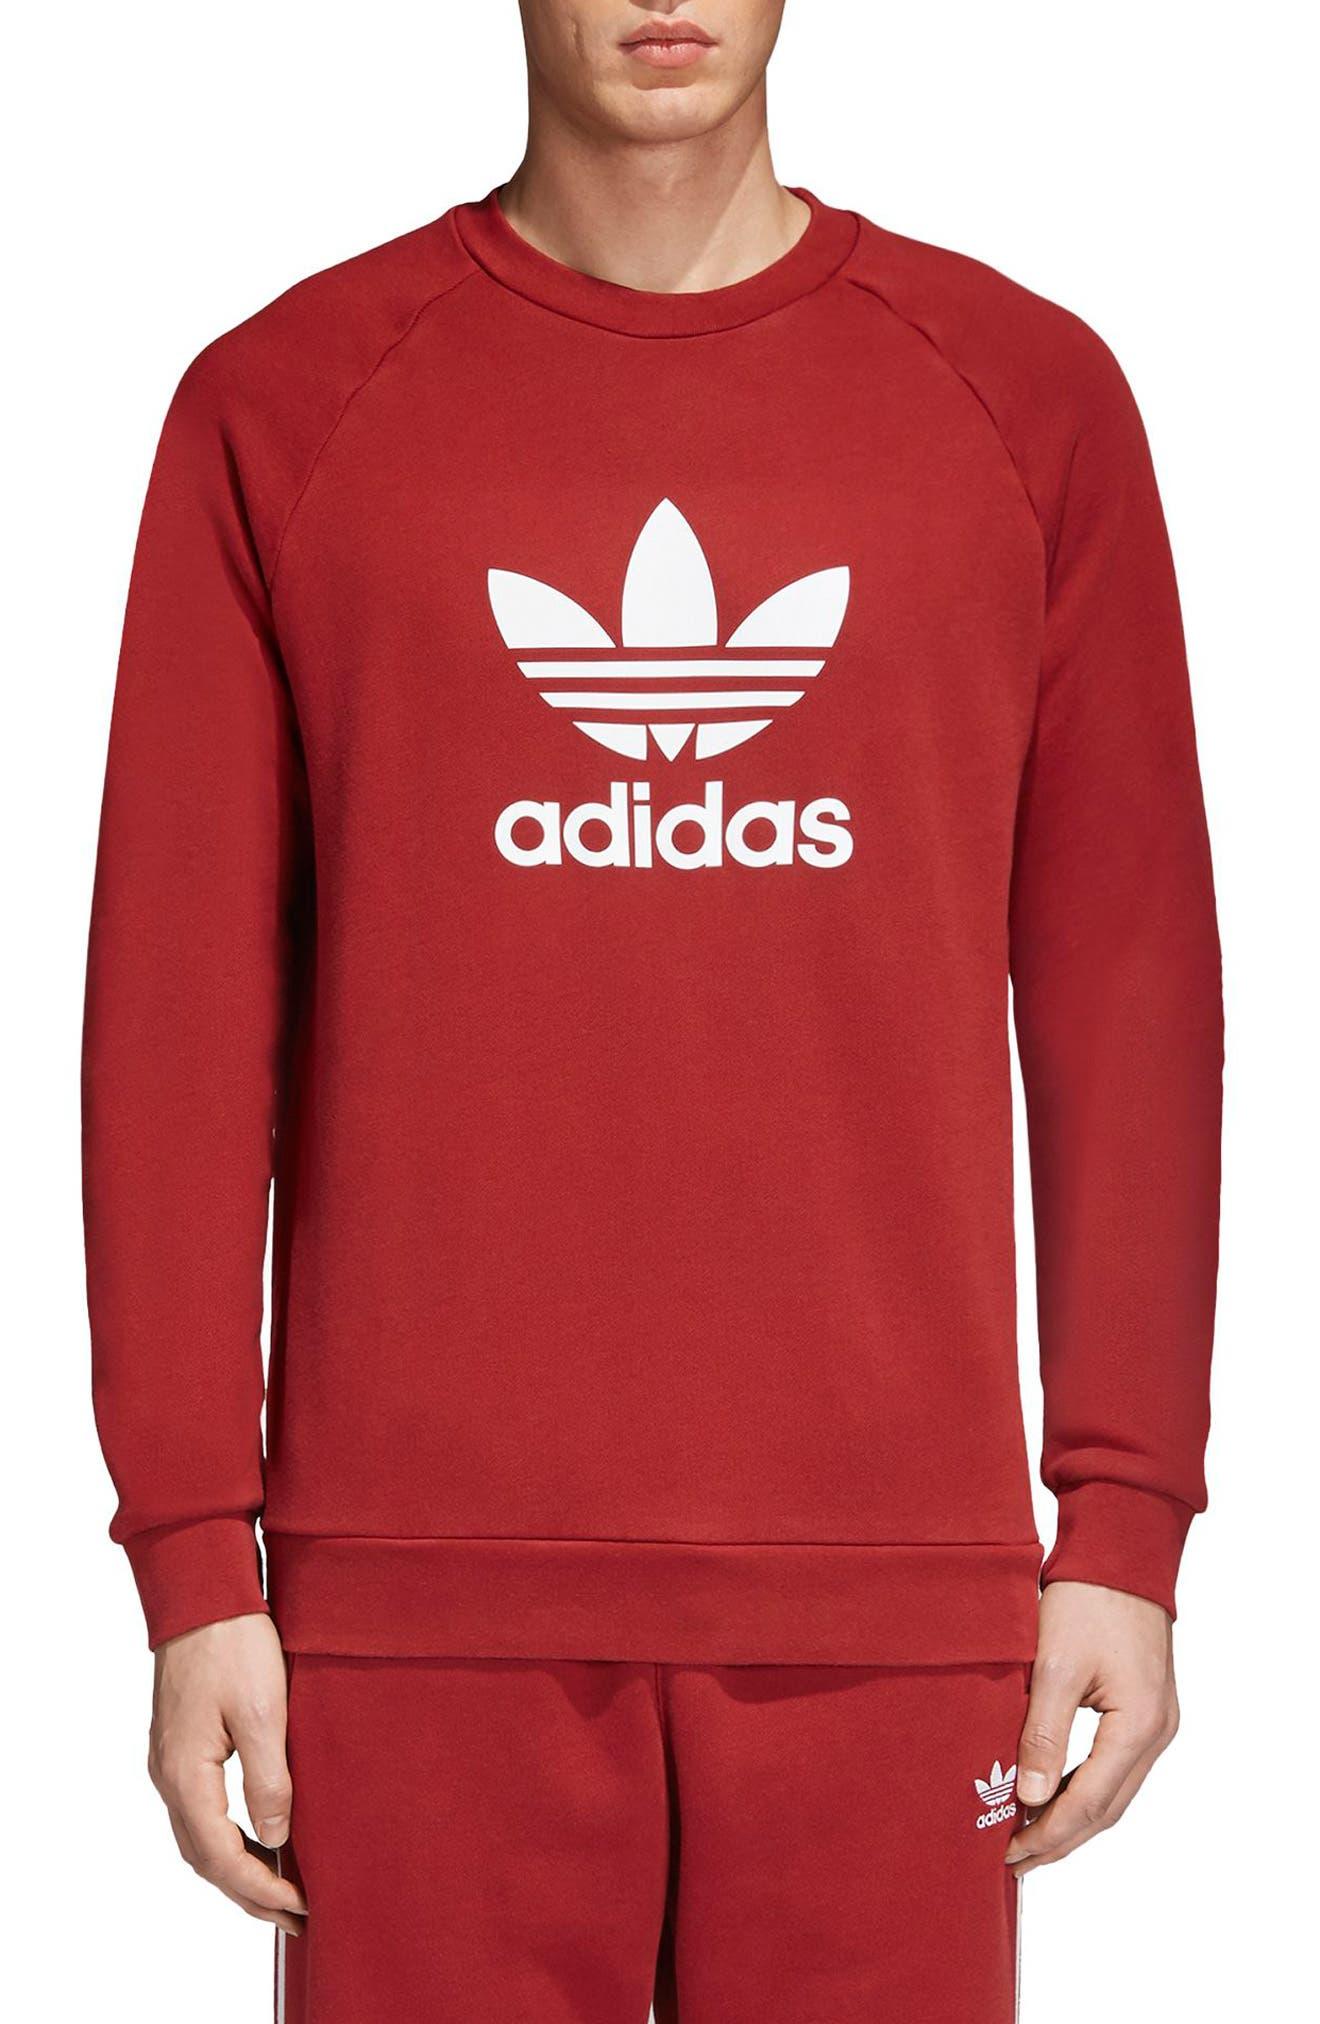 adidas Trefoil Crewneck Sweatshirt,                         Main,                         color, Rusred